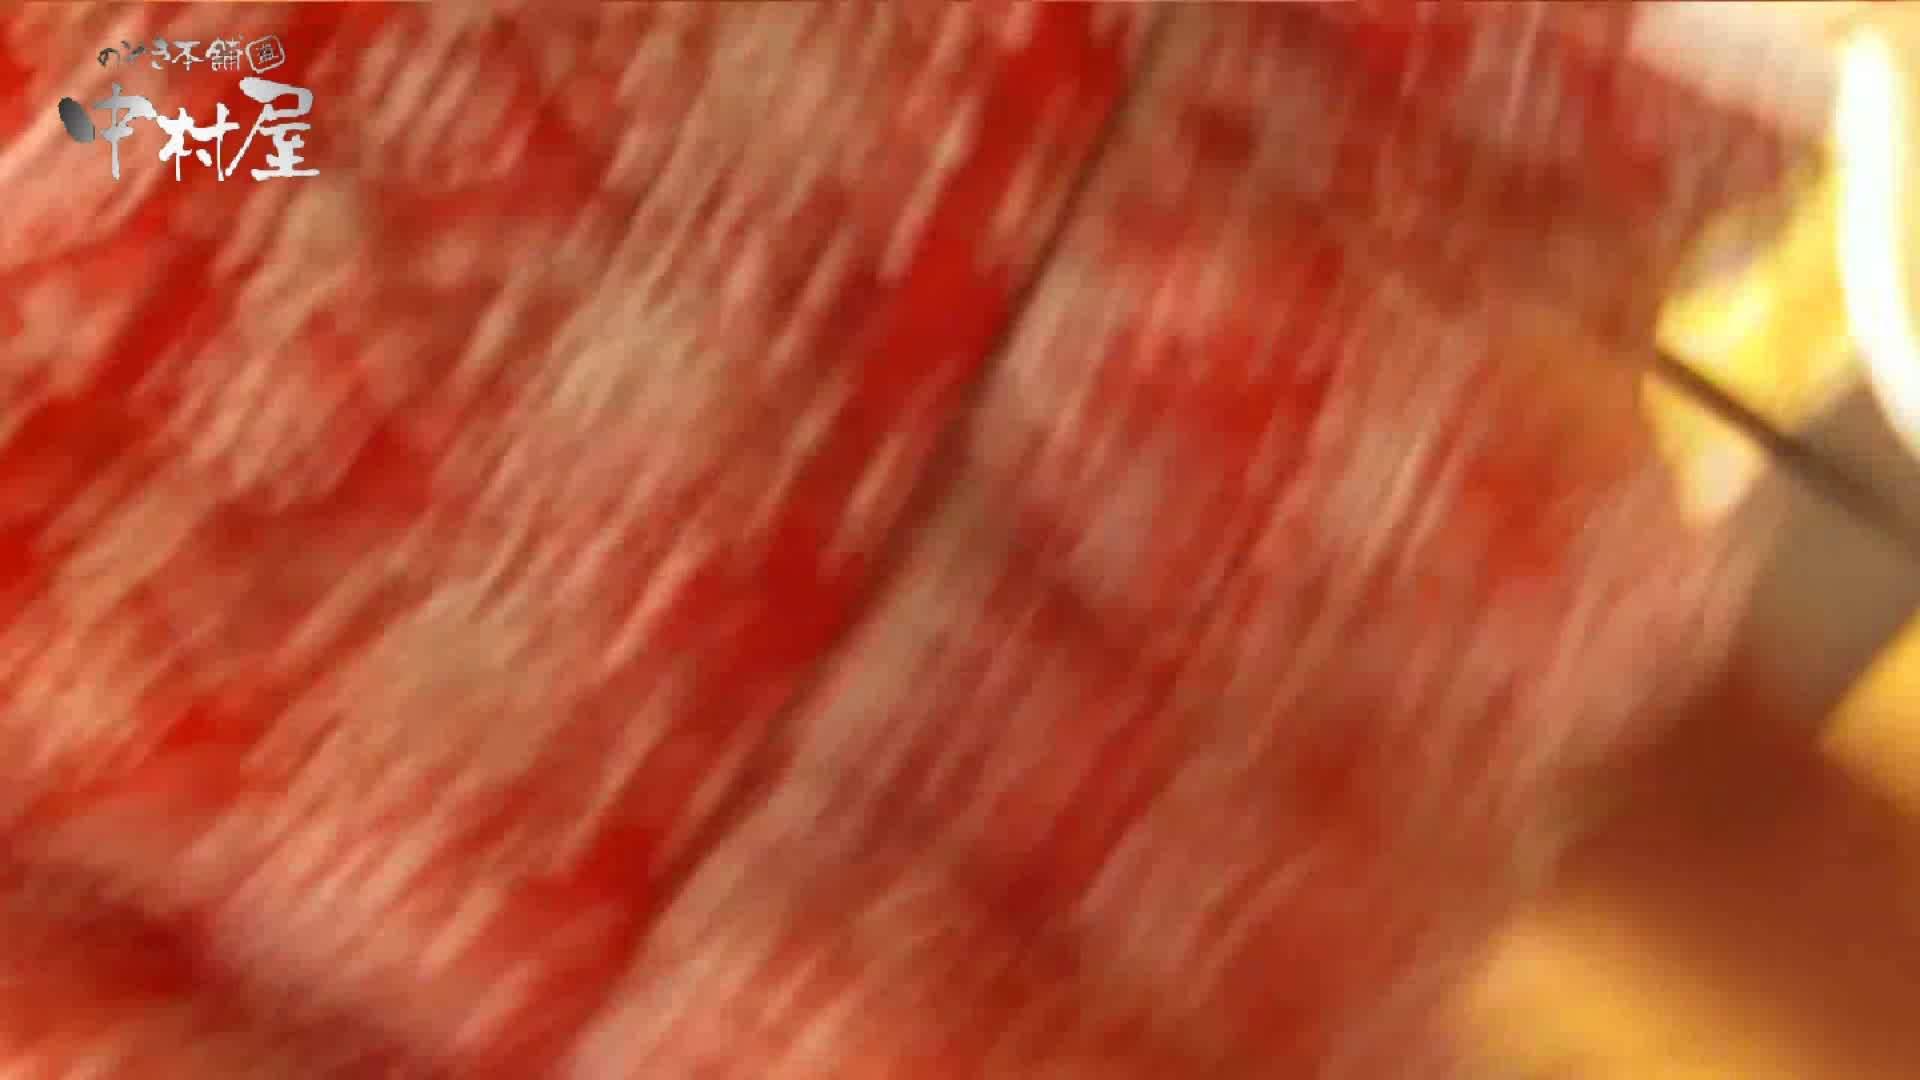 vol.43 可愛いカリスマ店員限定‼胸チラ&パンチラ 美脚おねーさんの胸元ゲット! おまんこ  68PIX 60